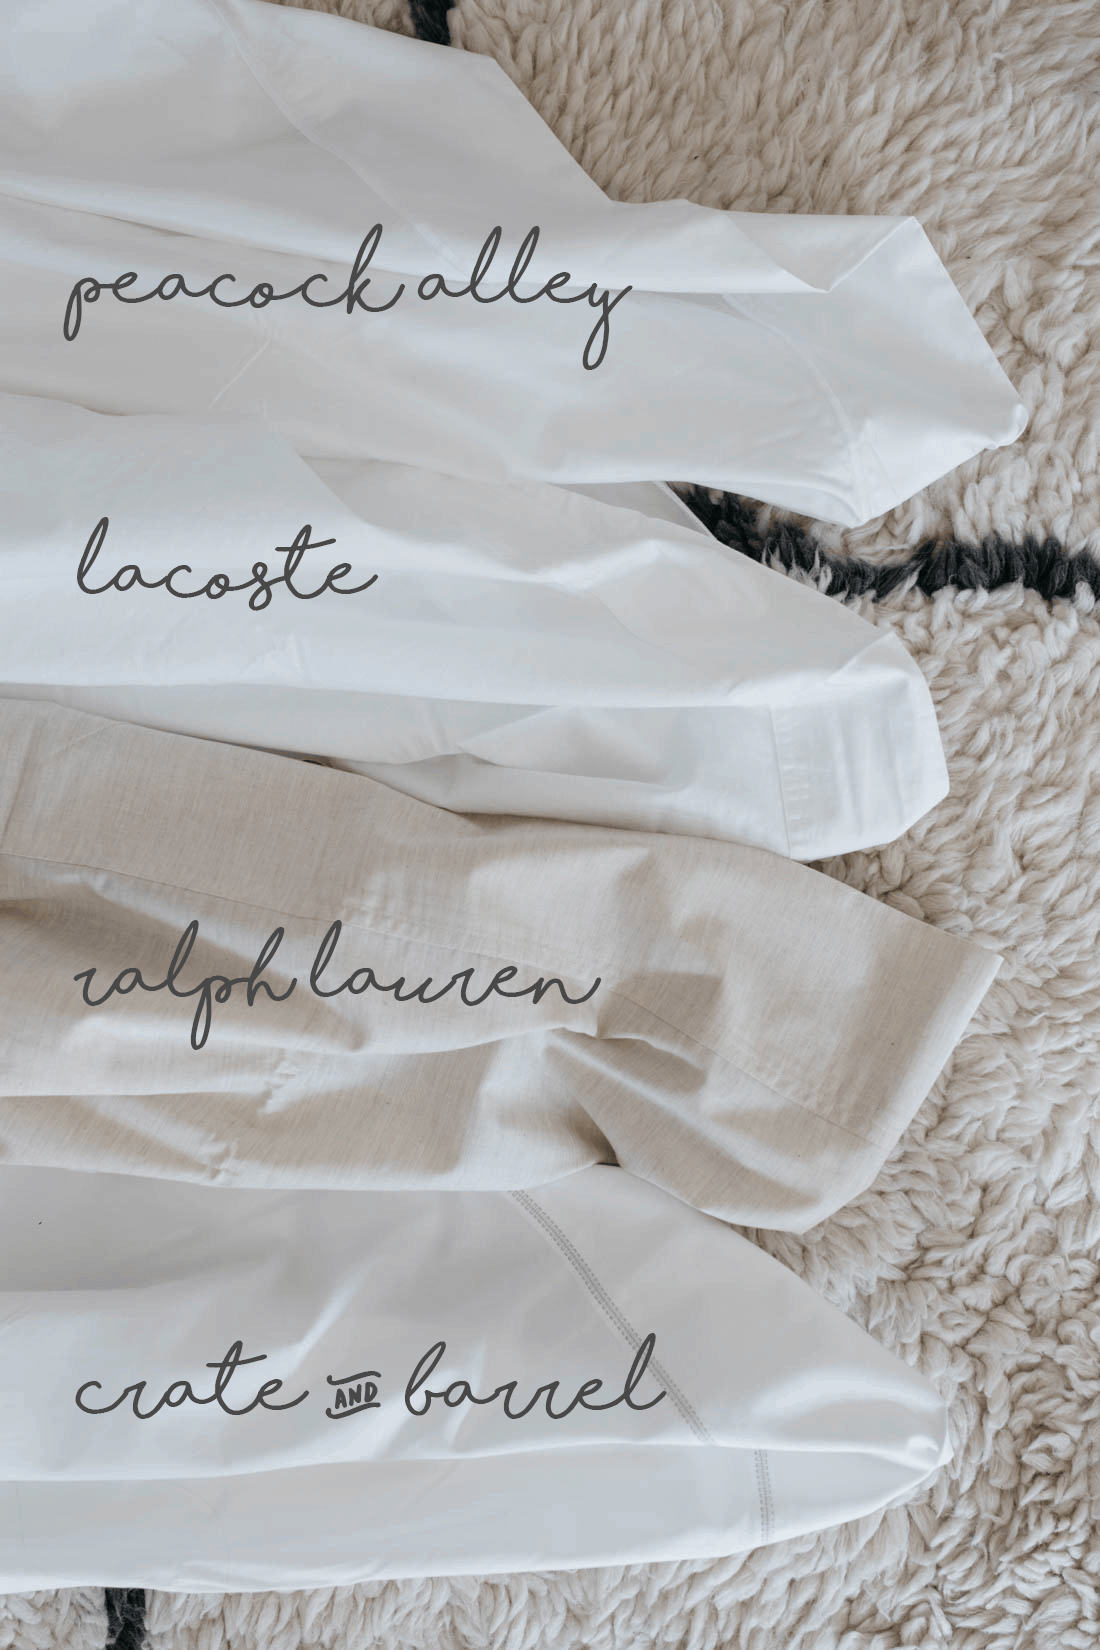 Parcale vs. Sateen Sheets